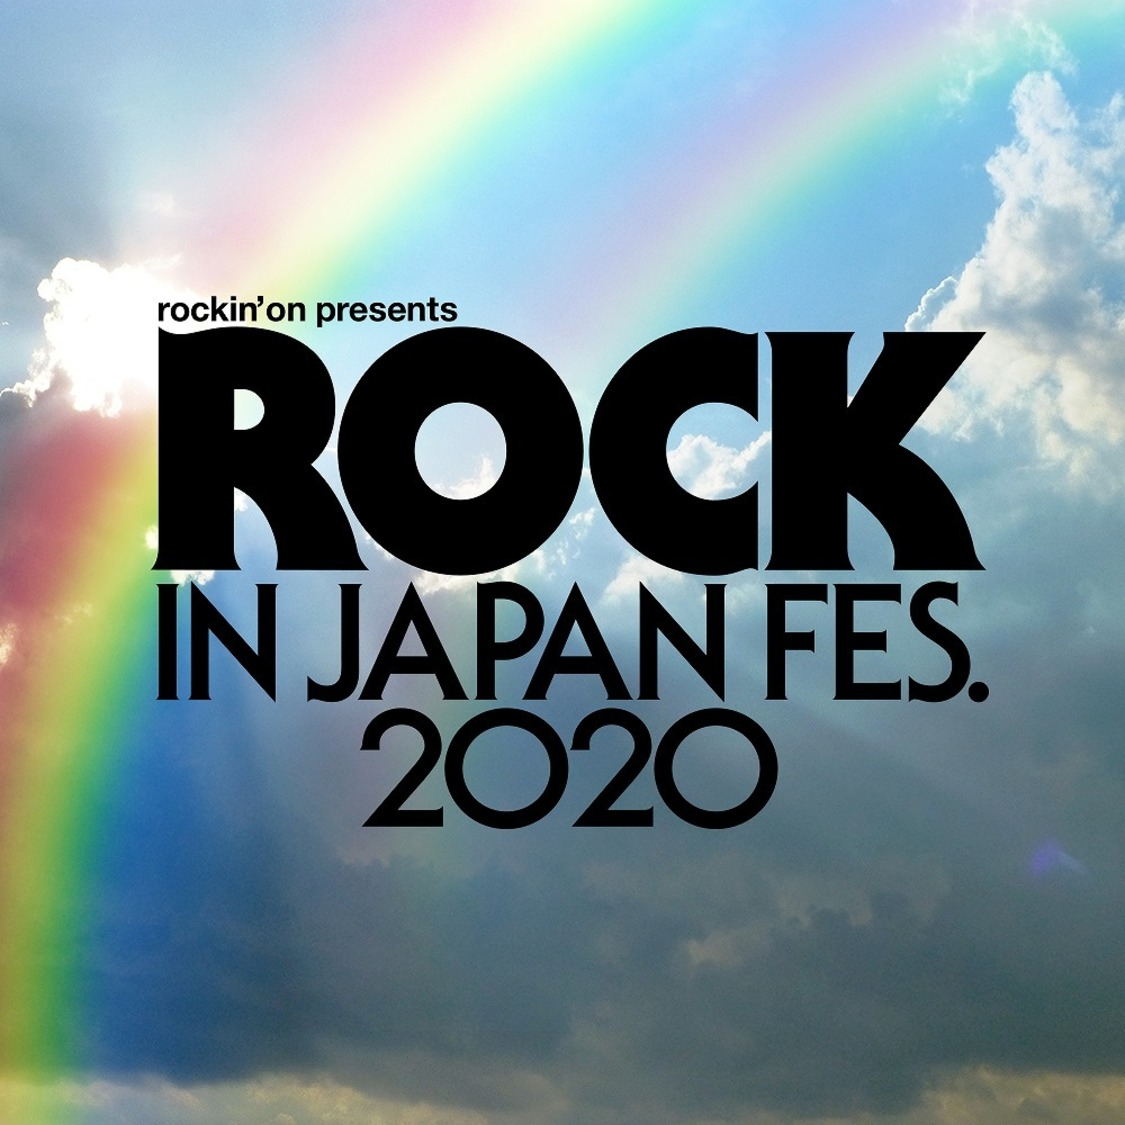 <ROCK IN JAPAN FESTIVAL 2020>、出演予定だったアーティスト発表!